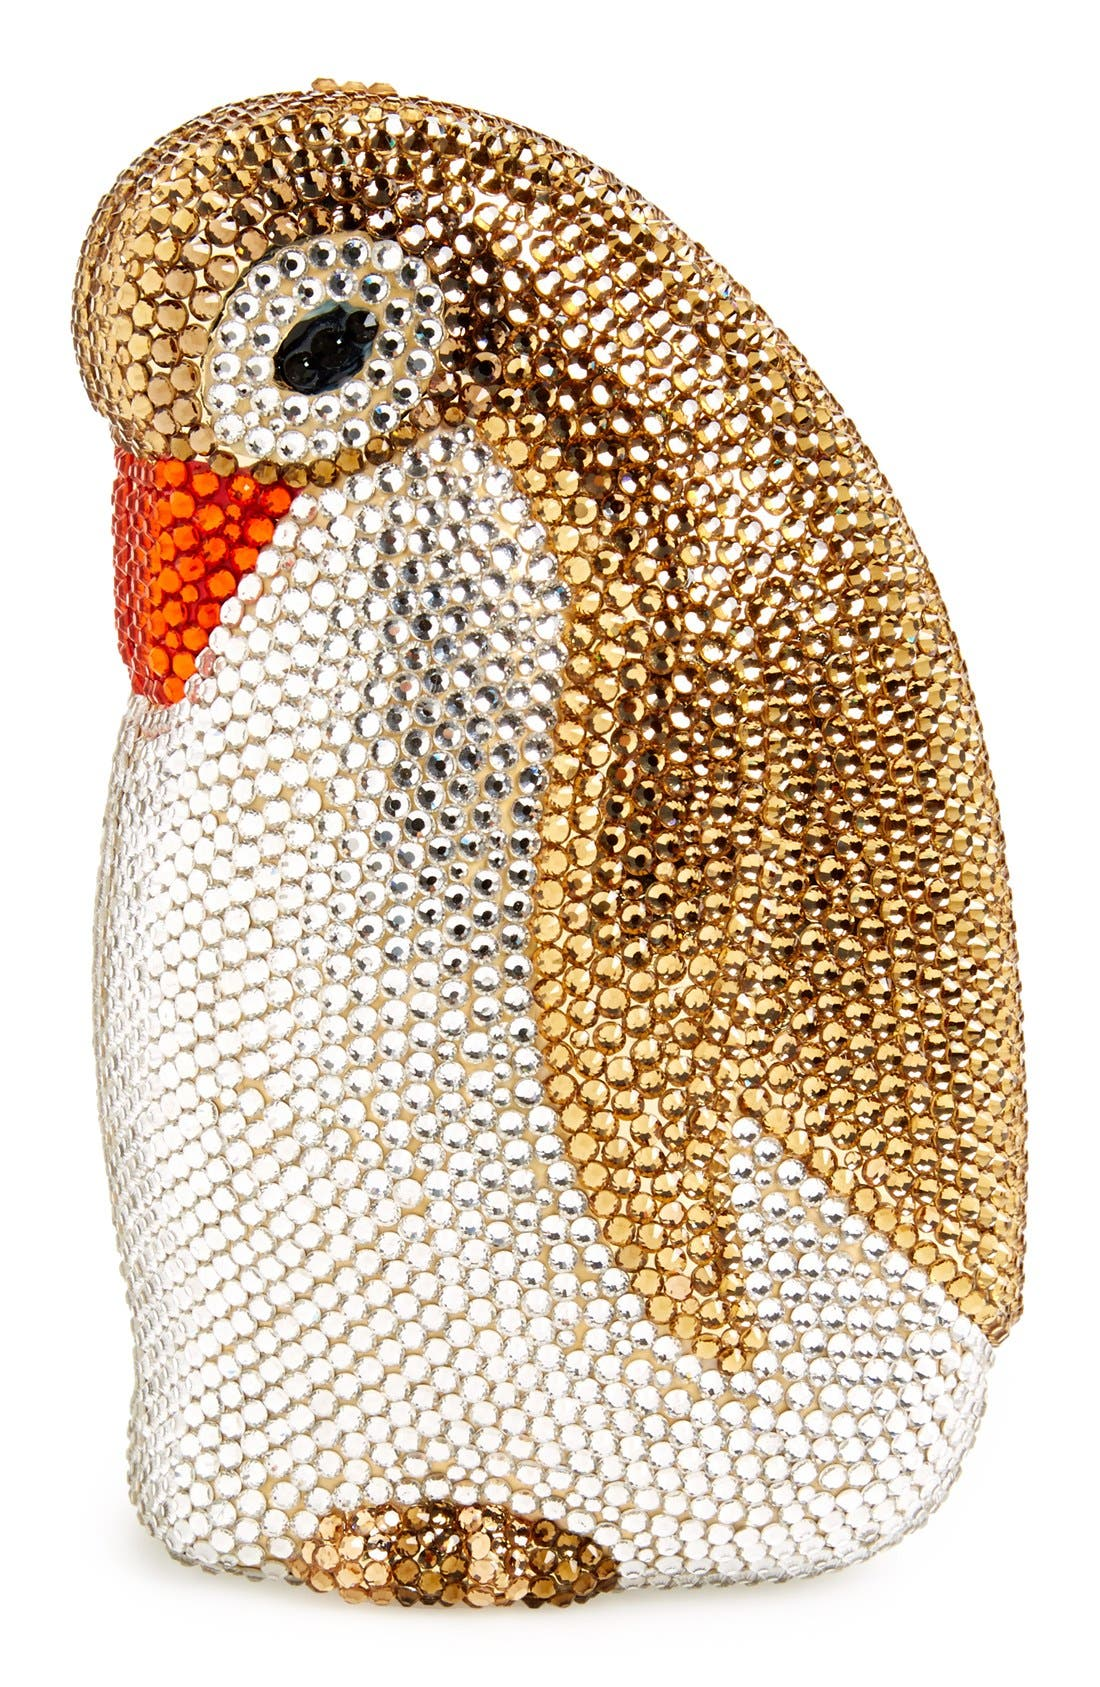 ZZDNU NATASHA COUTURE Natasha Couture 'Penny The Penguin' Crystal Clutch, Main, color, 230